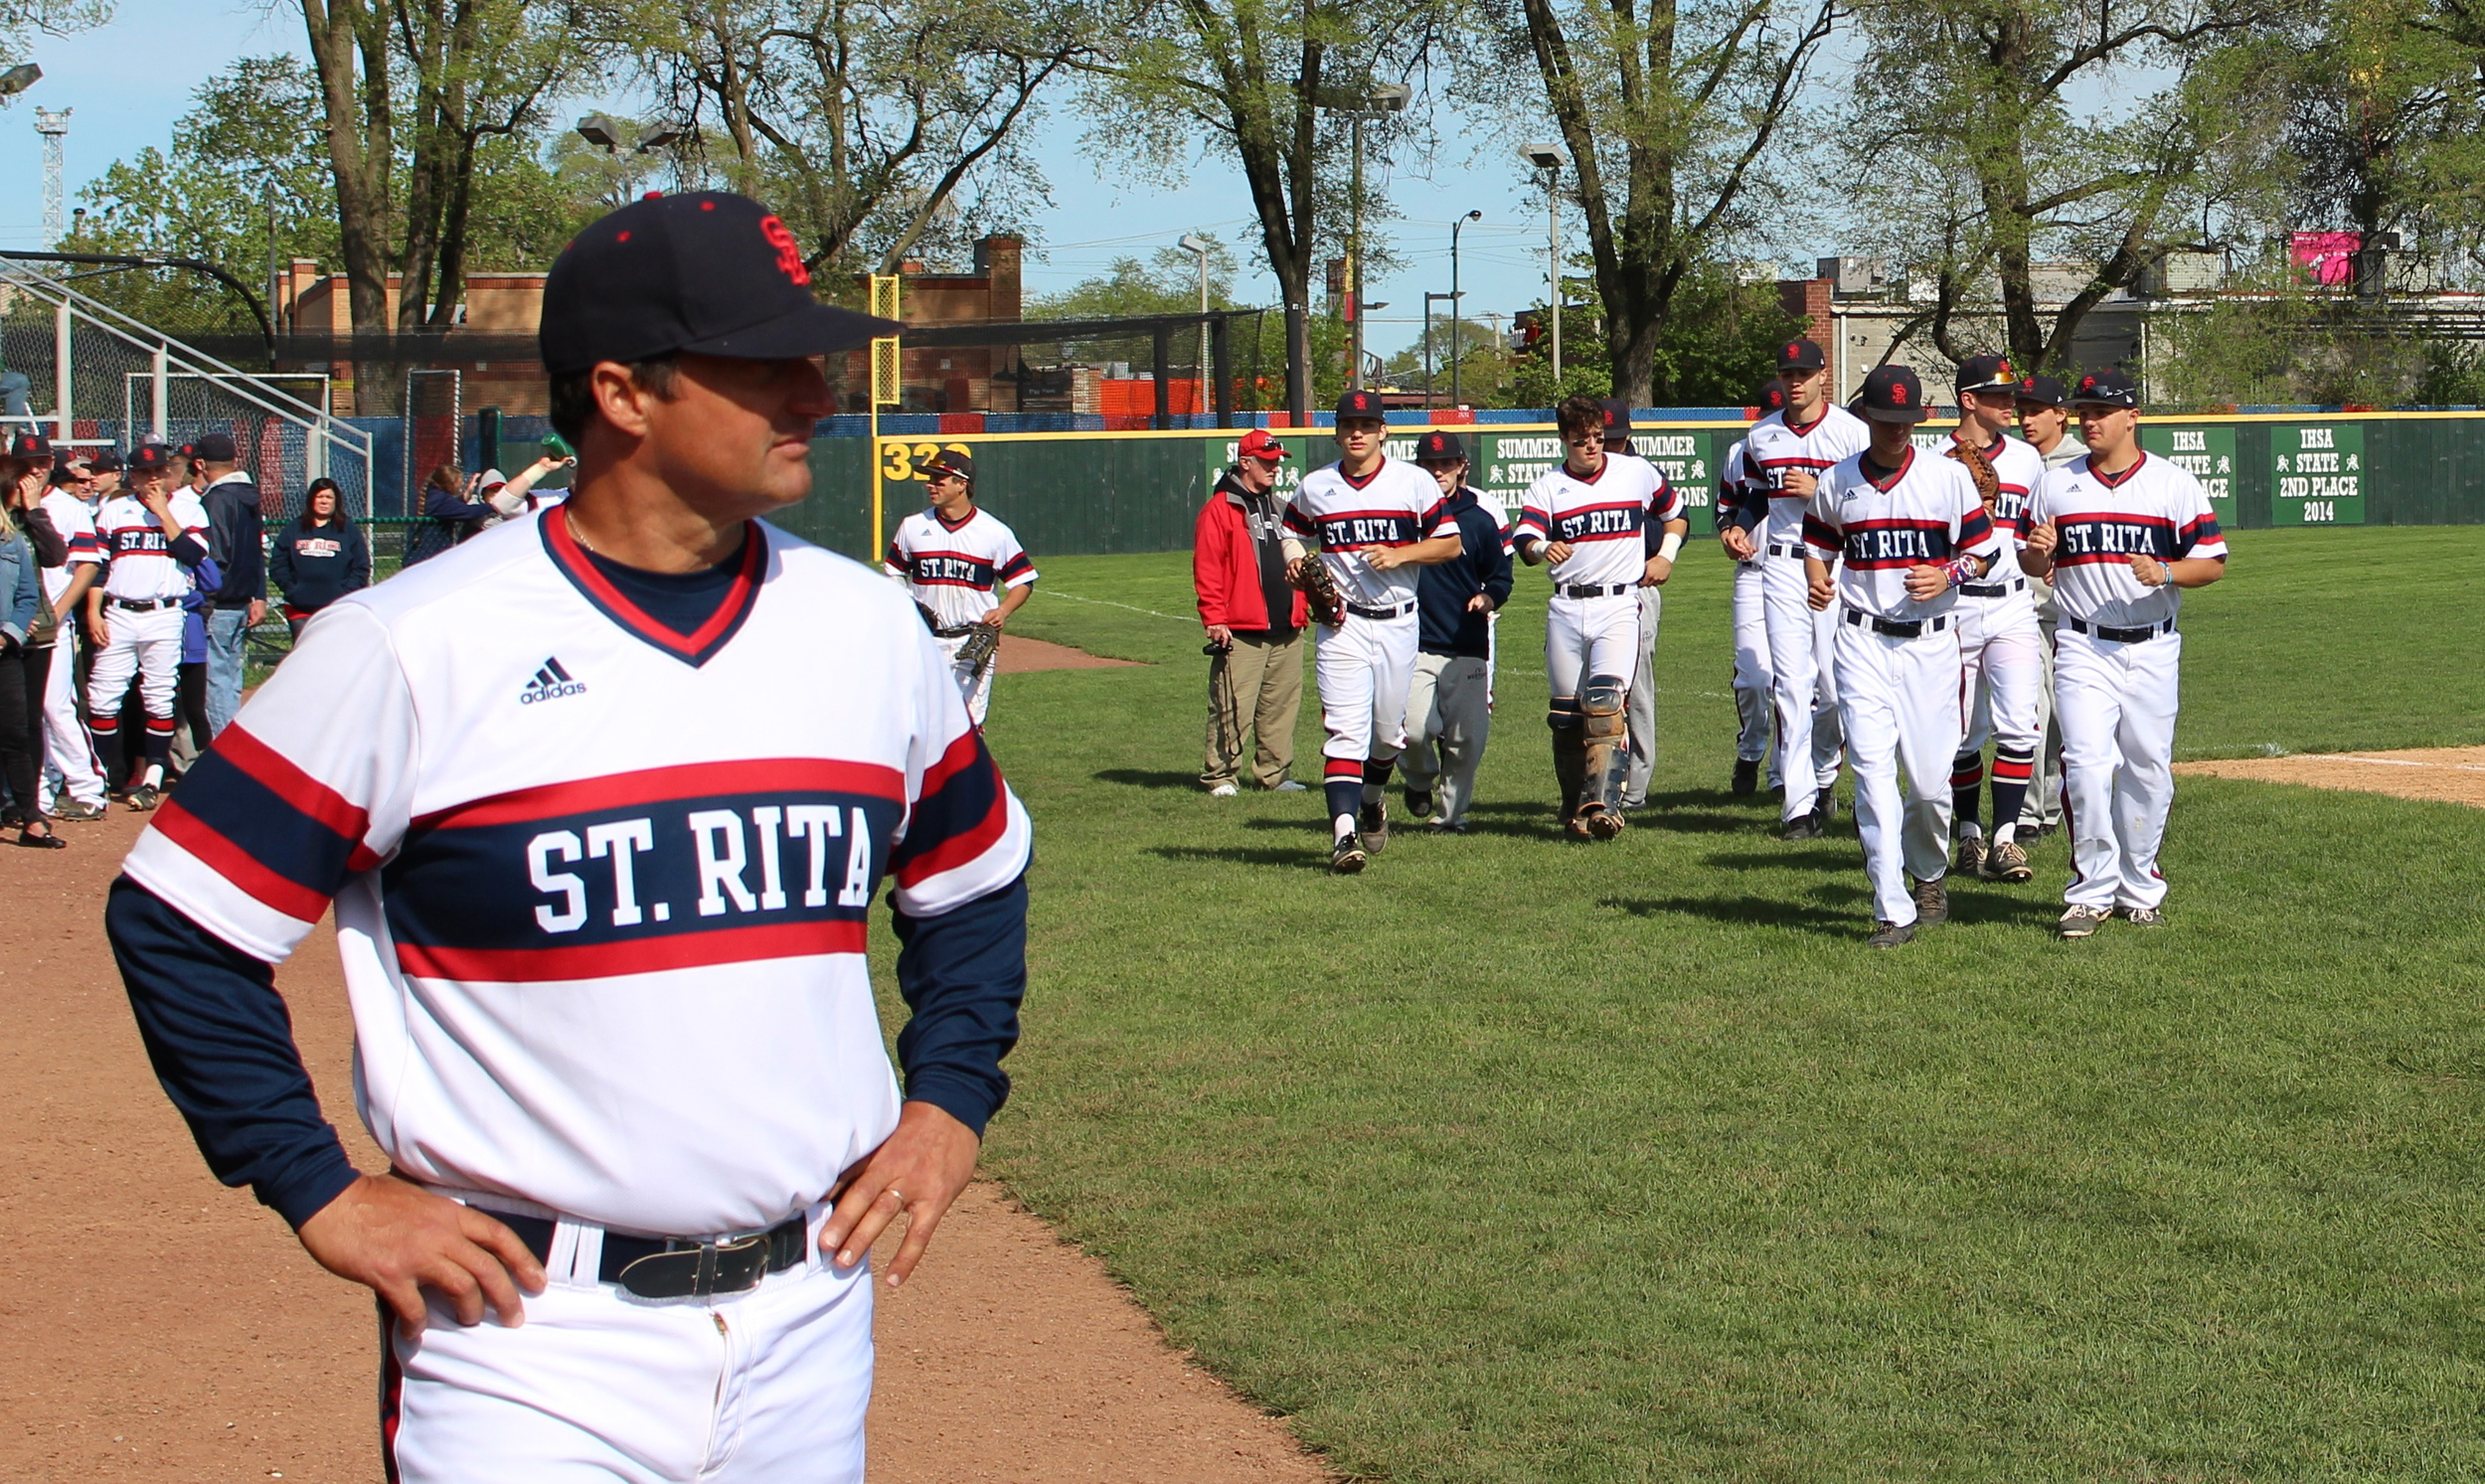 St. Rita Head Baseball Coach Mike Zunica and the St. Rita Mustangs Baseball Team